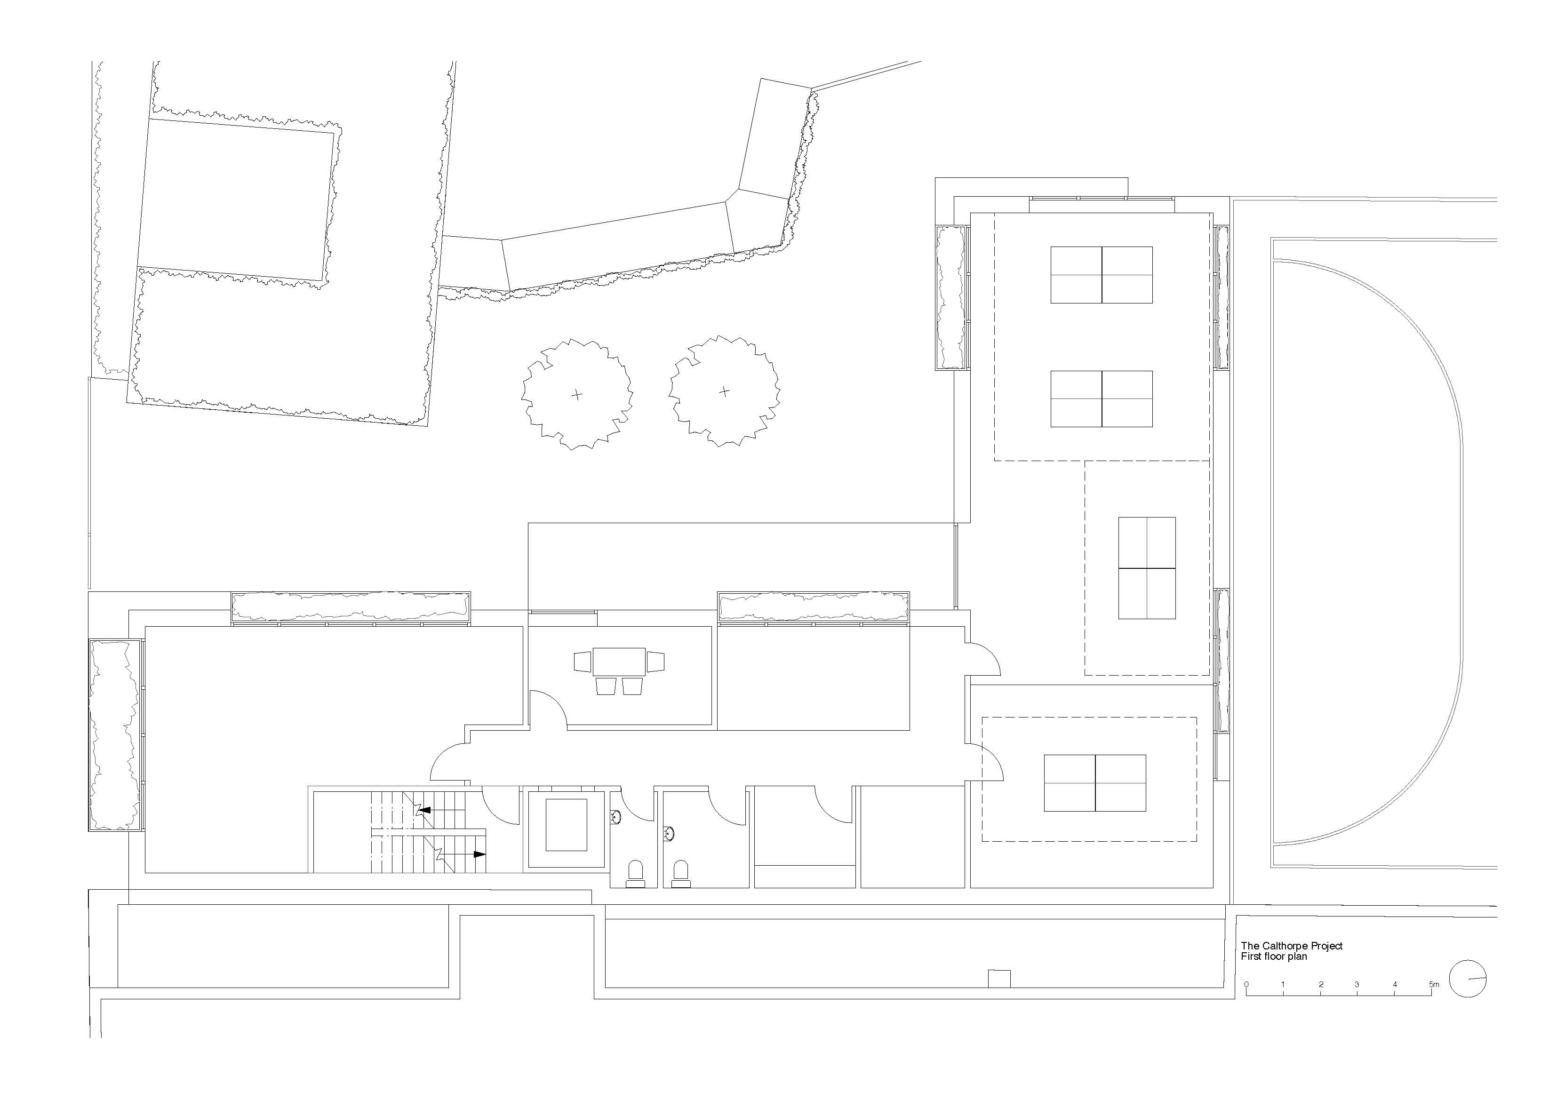 The Calthorpe first floor plan